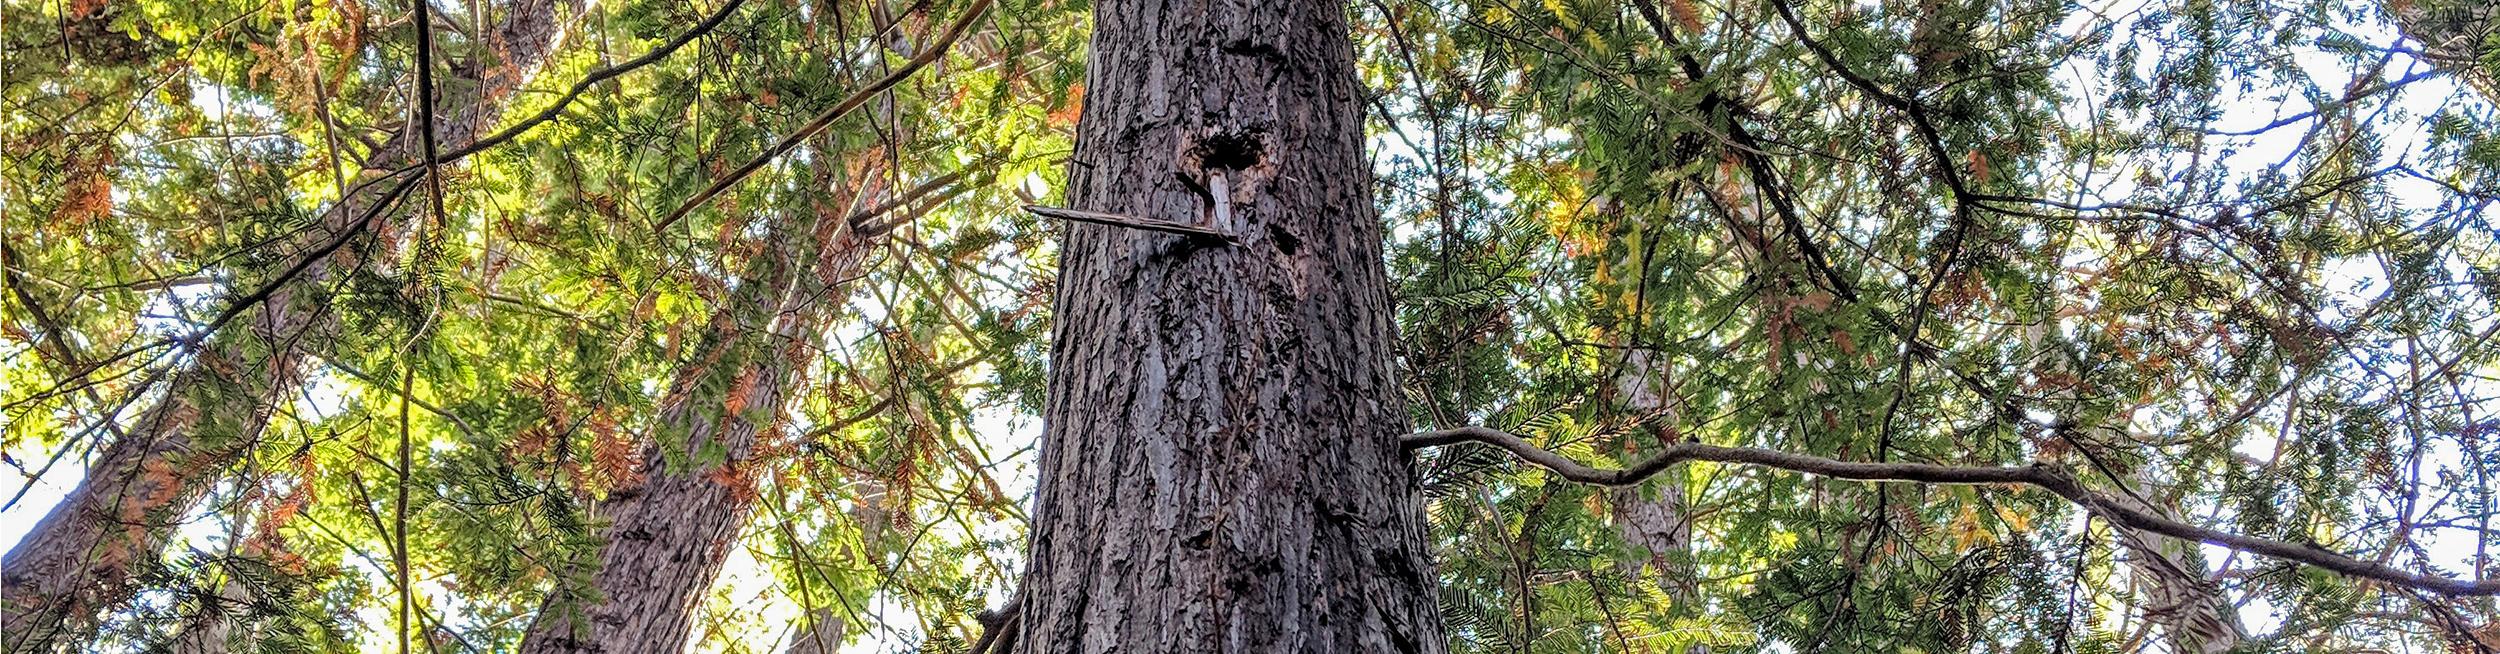 Redwood Grove cover photo.jpg